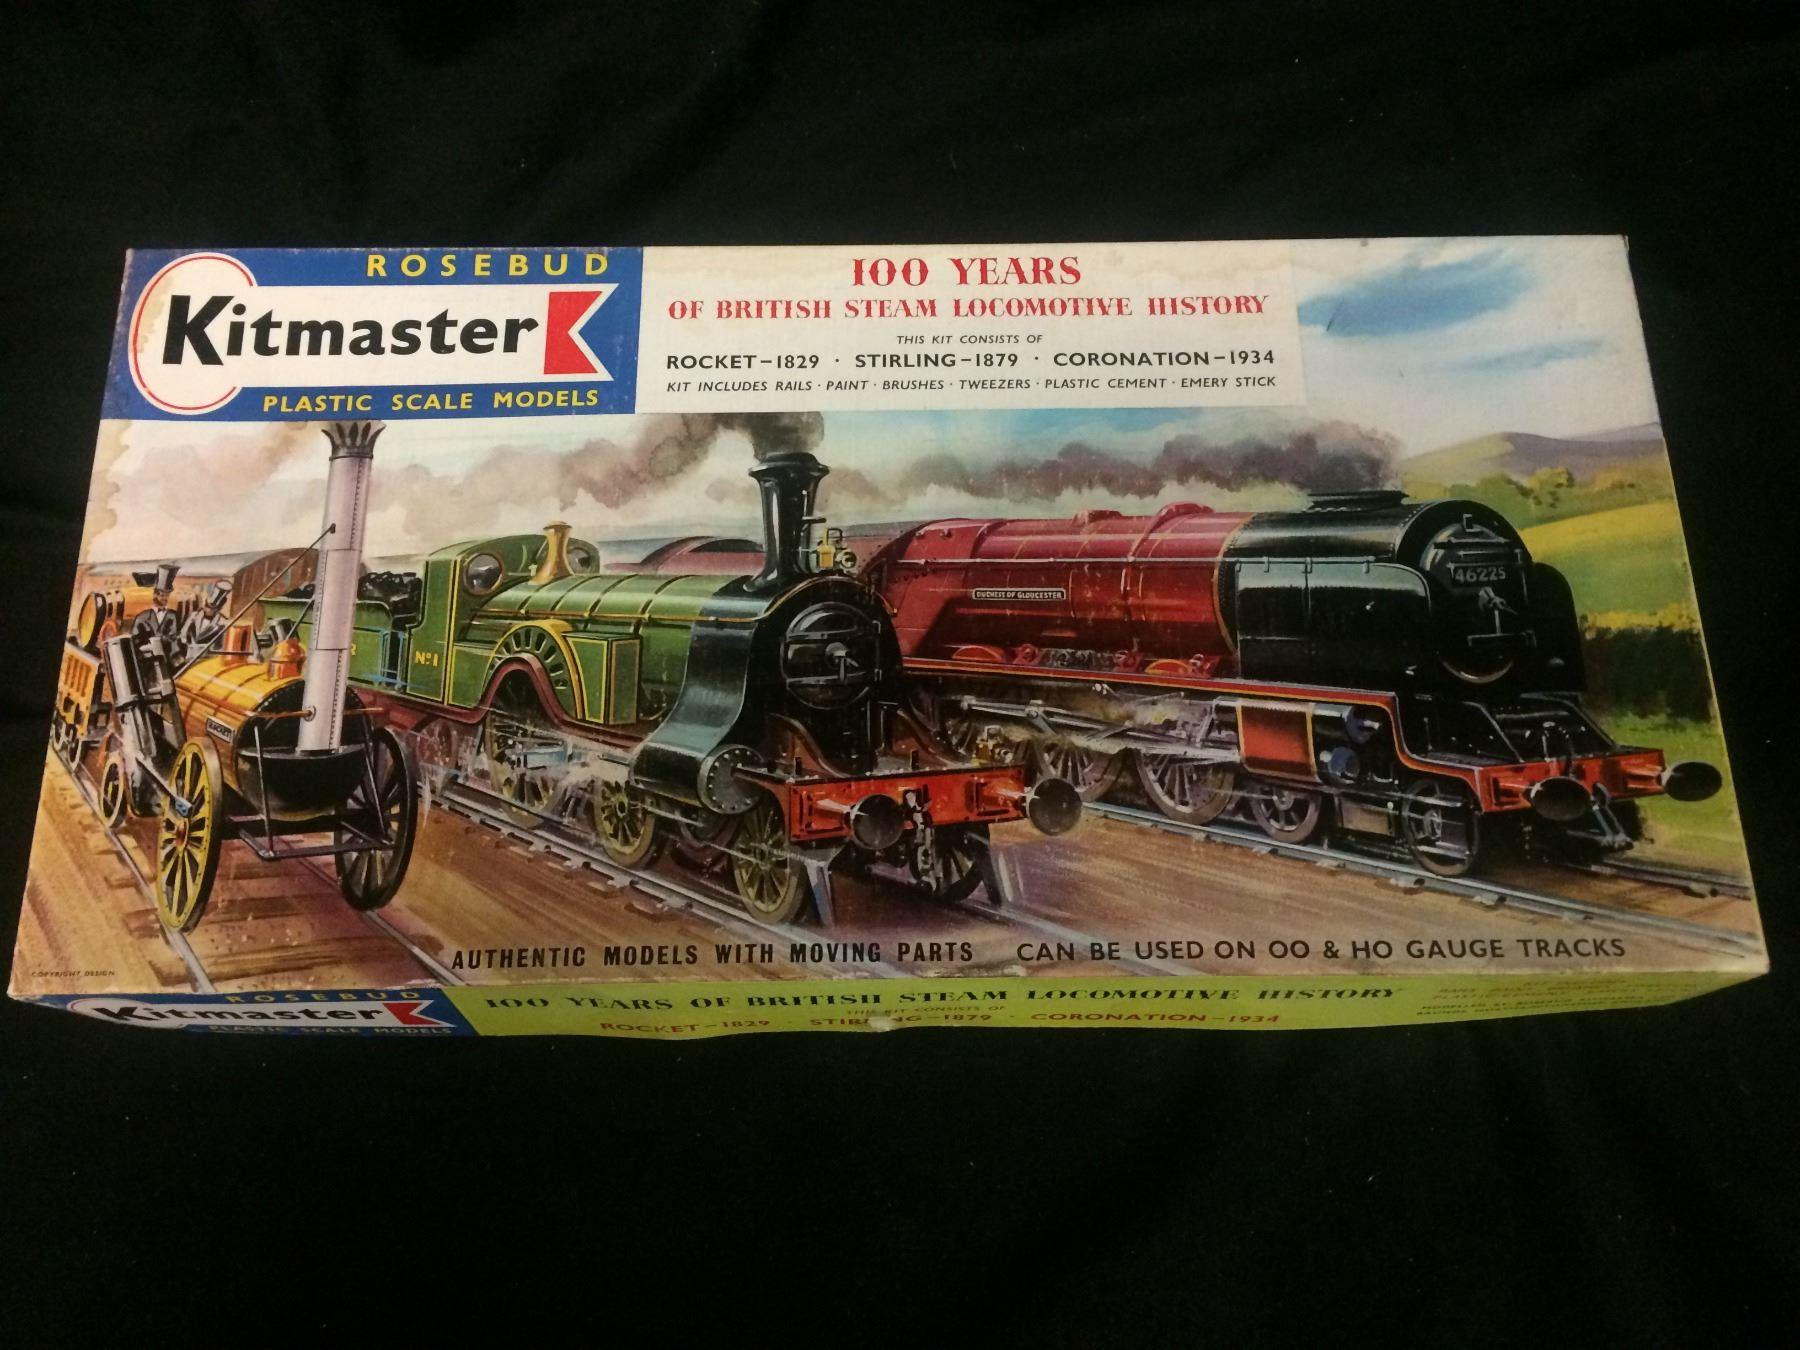 ROSEBUD KITMASTER PLASTIC MODEL KIT (IN BOXES) ROCKET-1829, STIRLING-1879,  CORONATION-1934